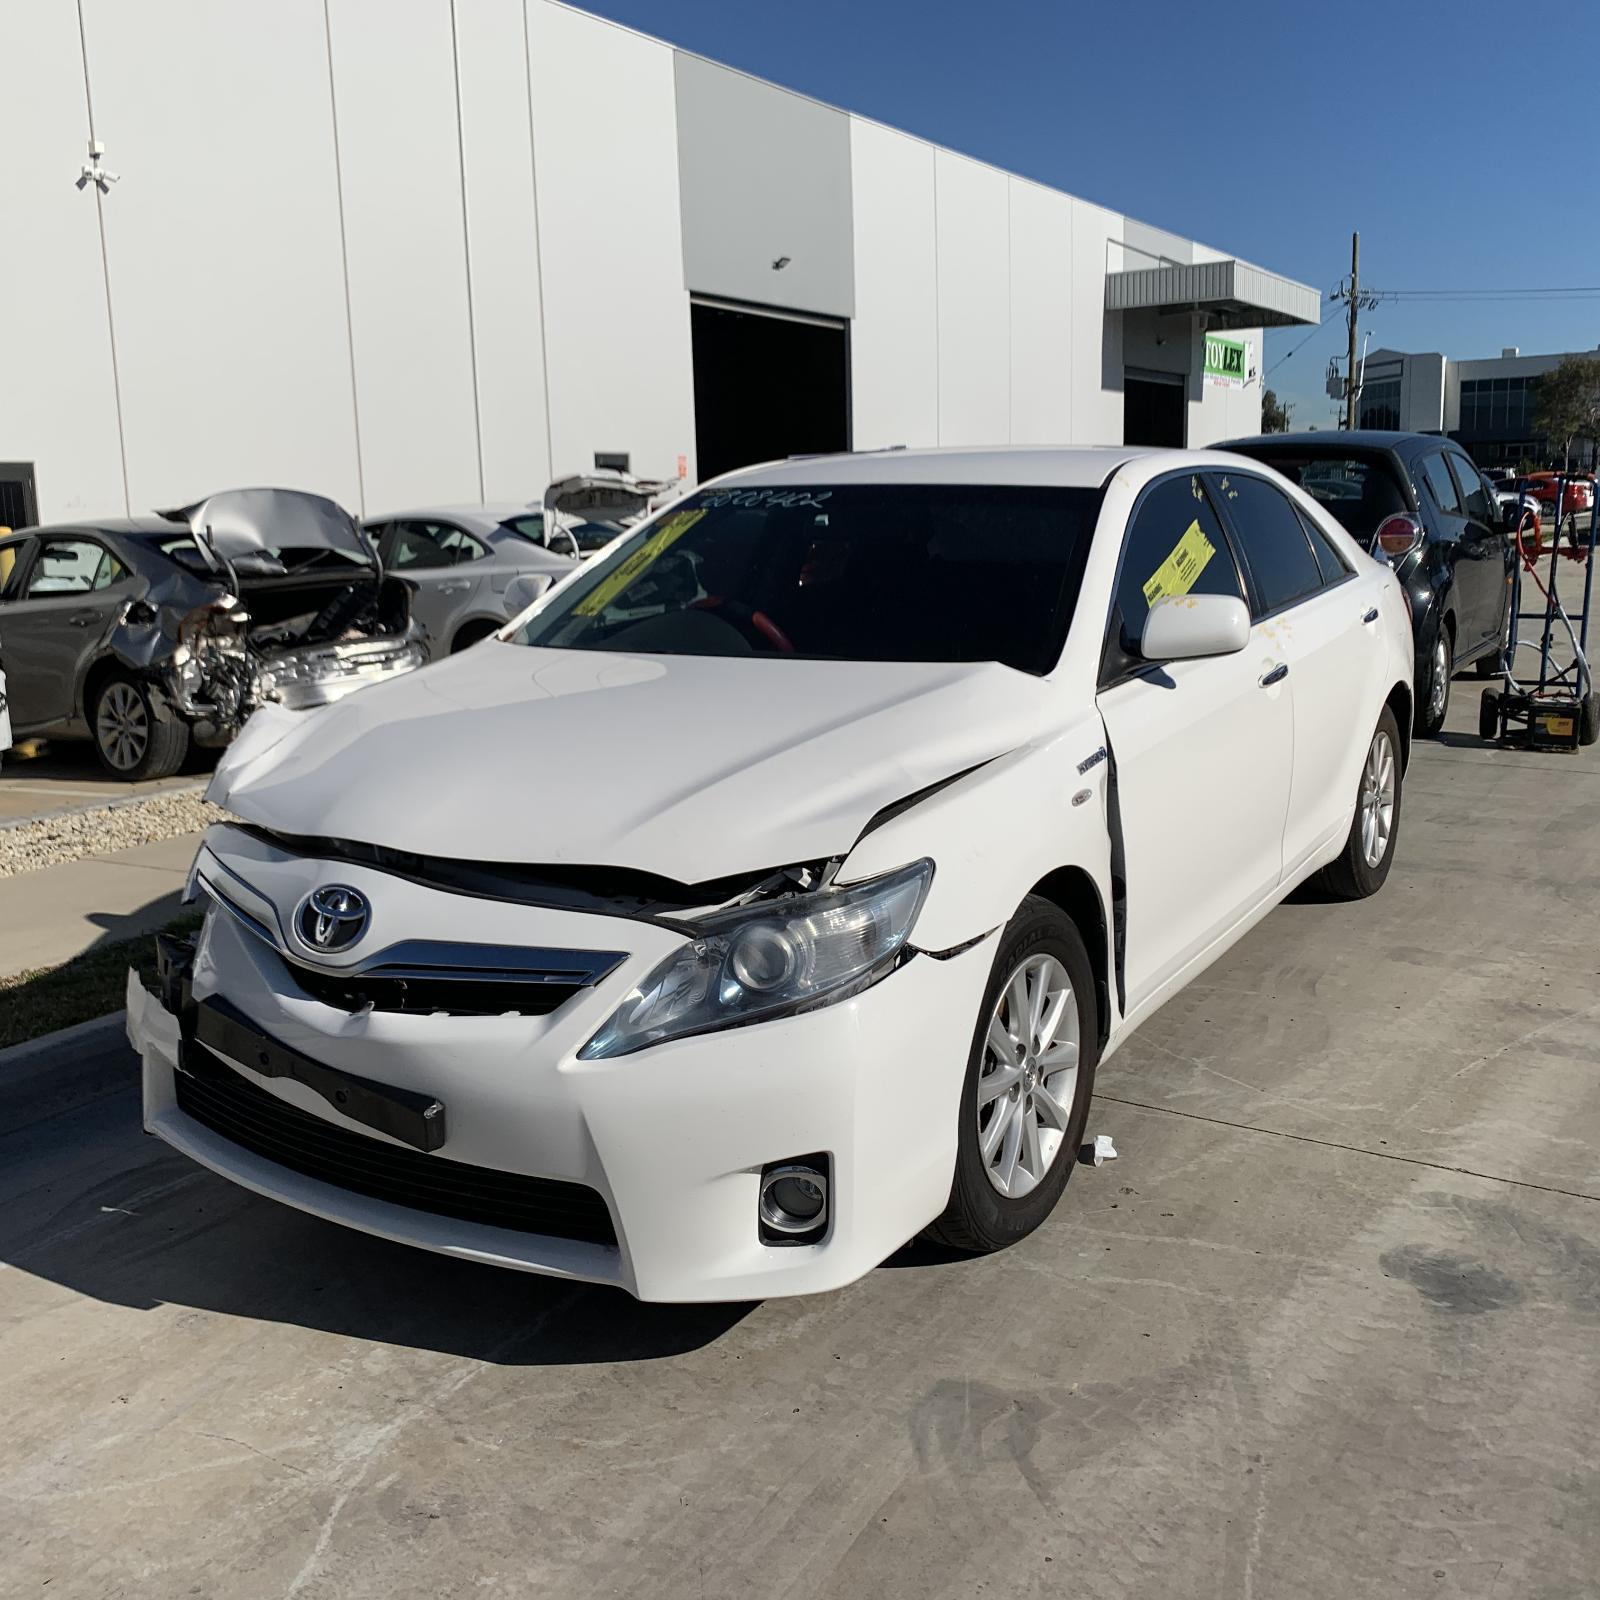 Toyota CAMRY HYBRID AHV40R 2AZ-FXE 2.4L Engine Automatic FWD Transmission 12/09 - 11/11